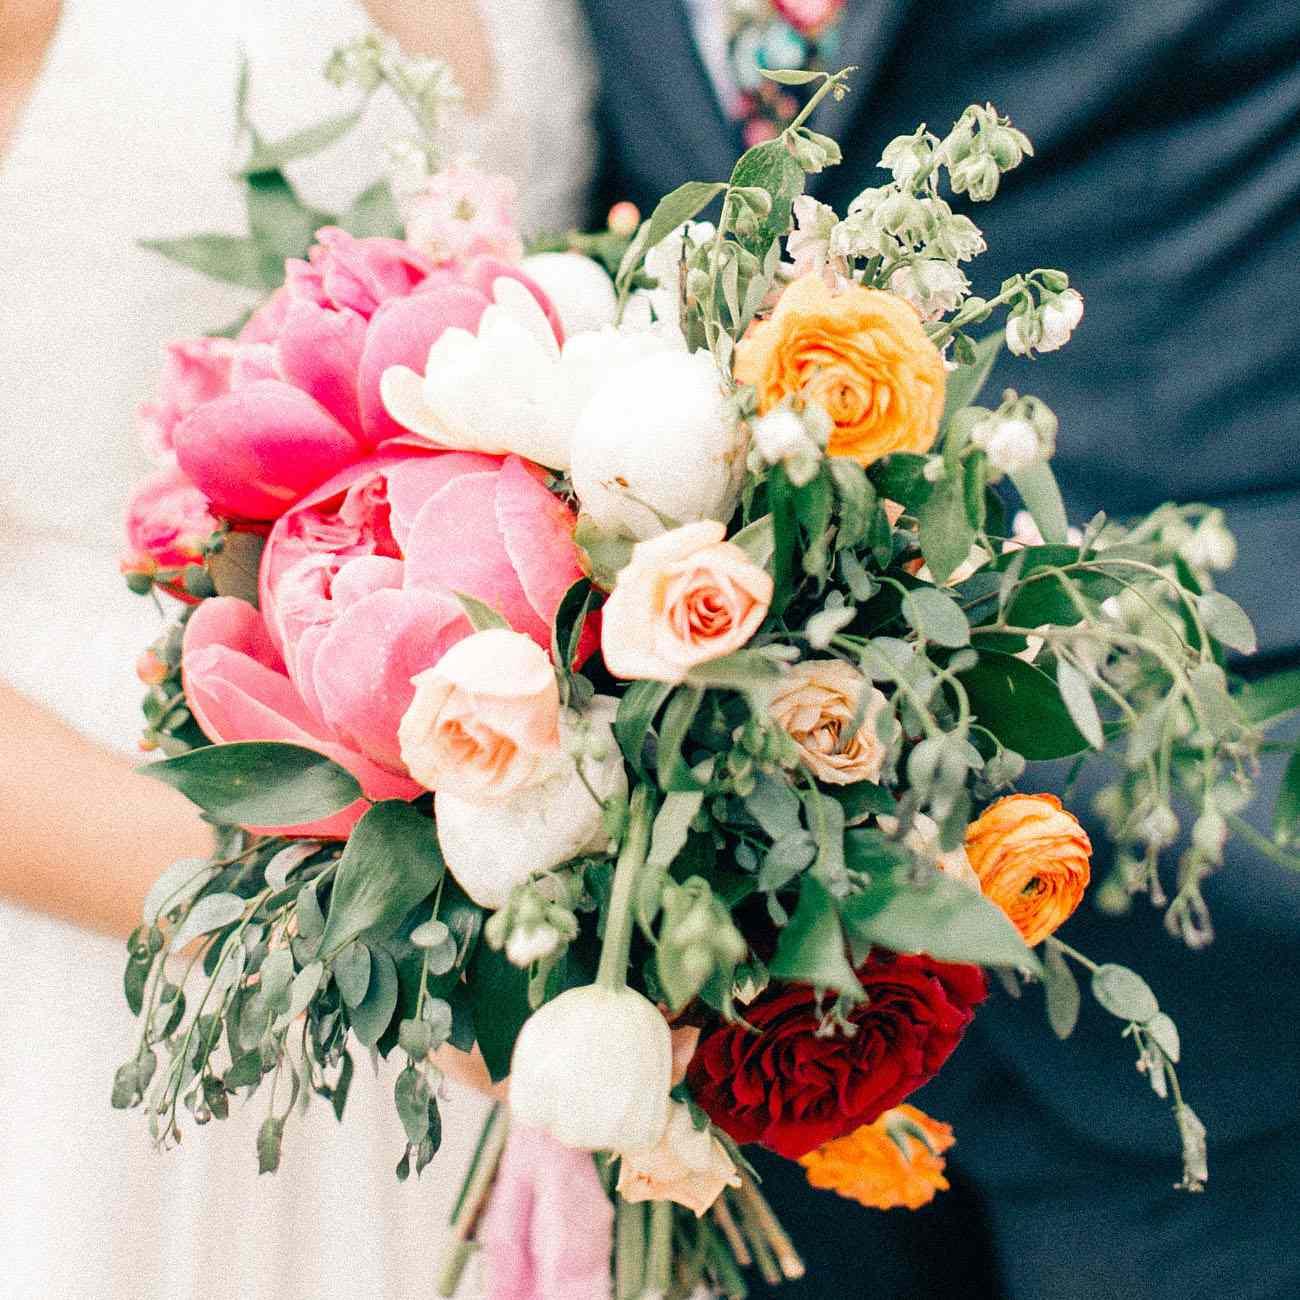 Peony bouquet with pops of crimson